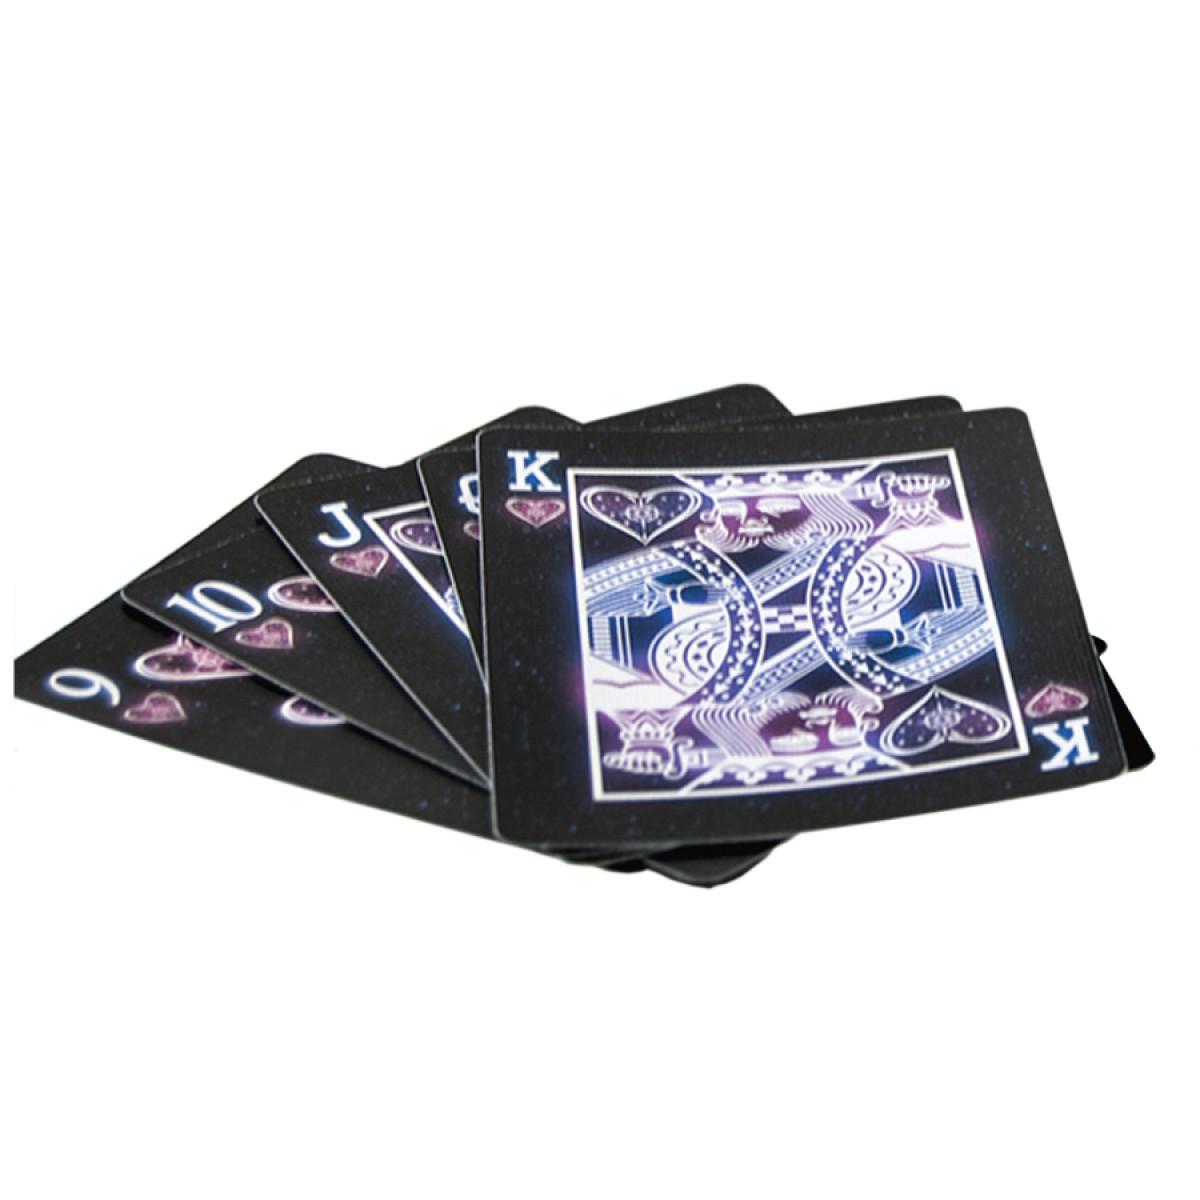 Bicycle Stargazer | Bicycle Playing Cards